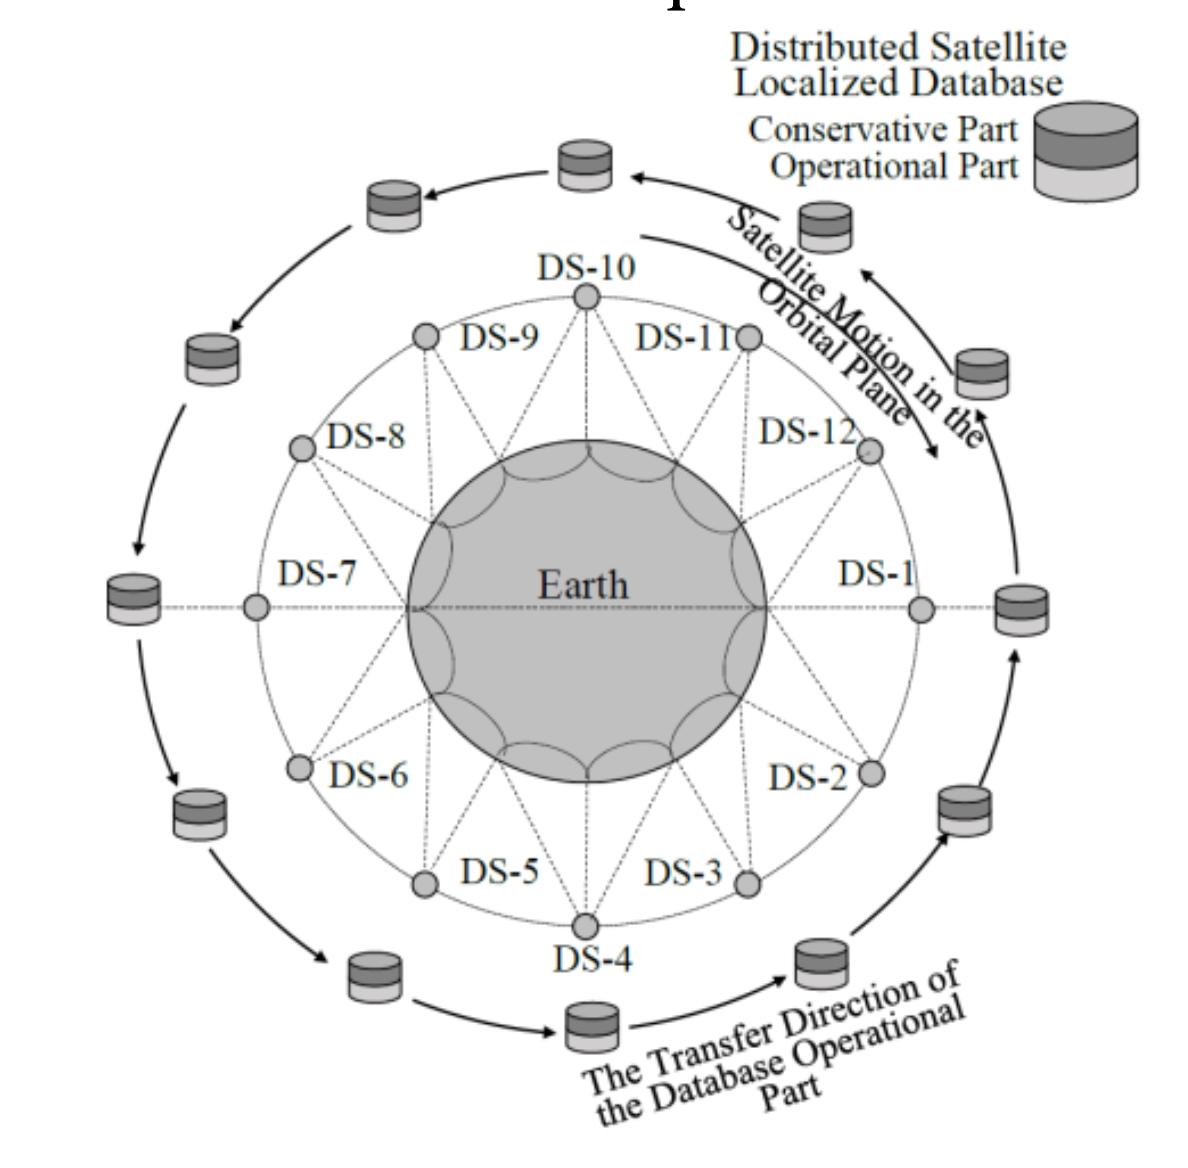 Distributed database of one LEO Satellite IoT System orbital plane